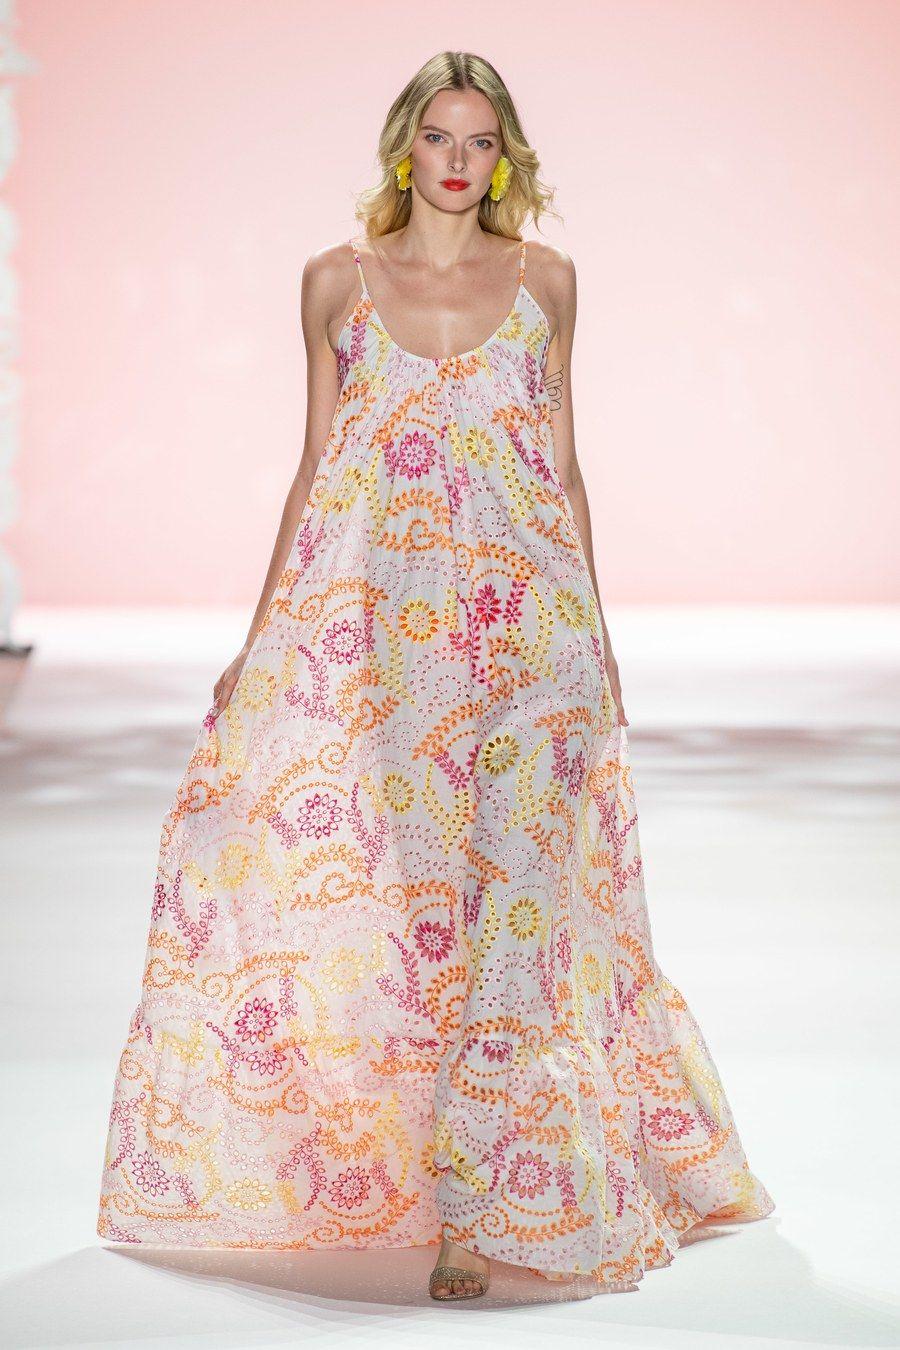 Spring 2020 Usa.Badgley Mischka Spring 2020 Ready To Wear Fashion Show In